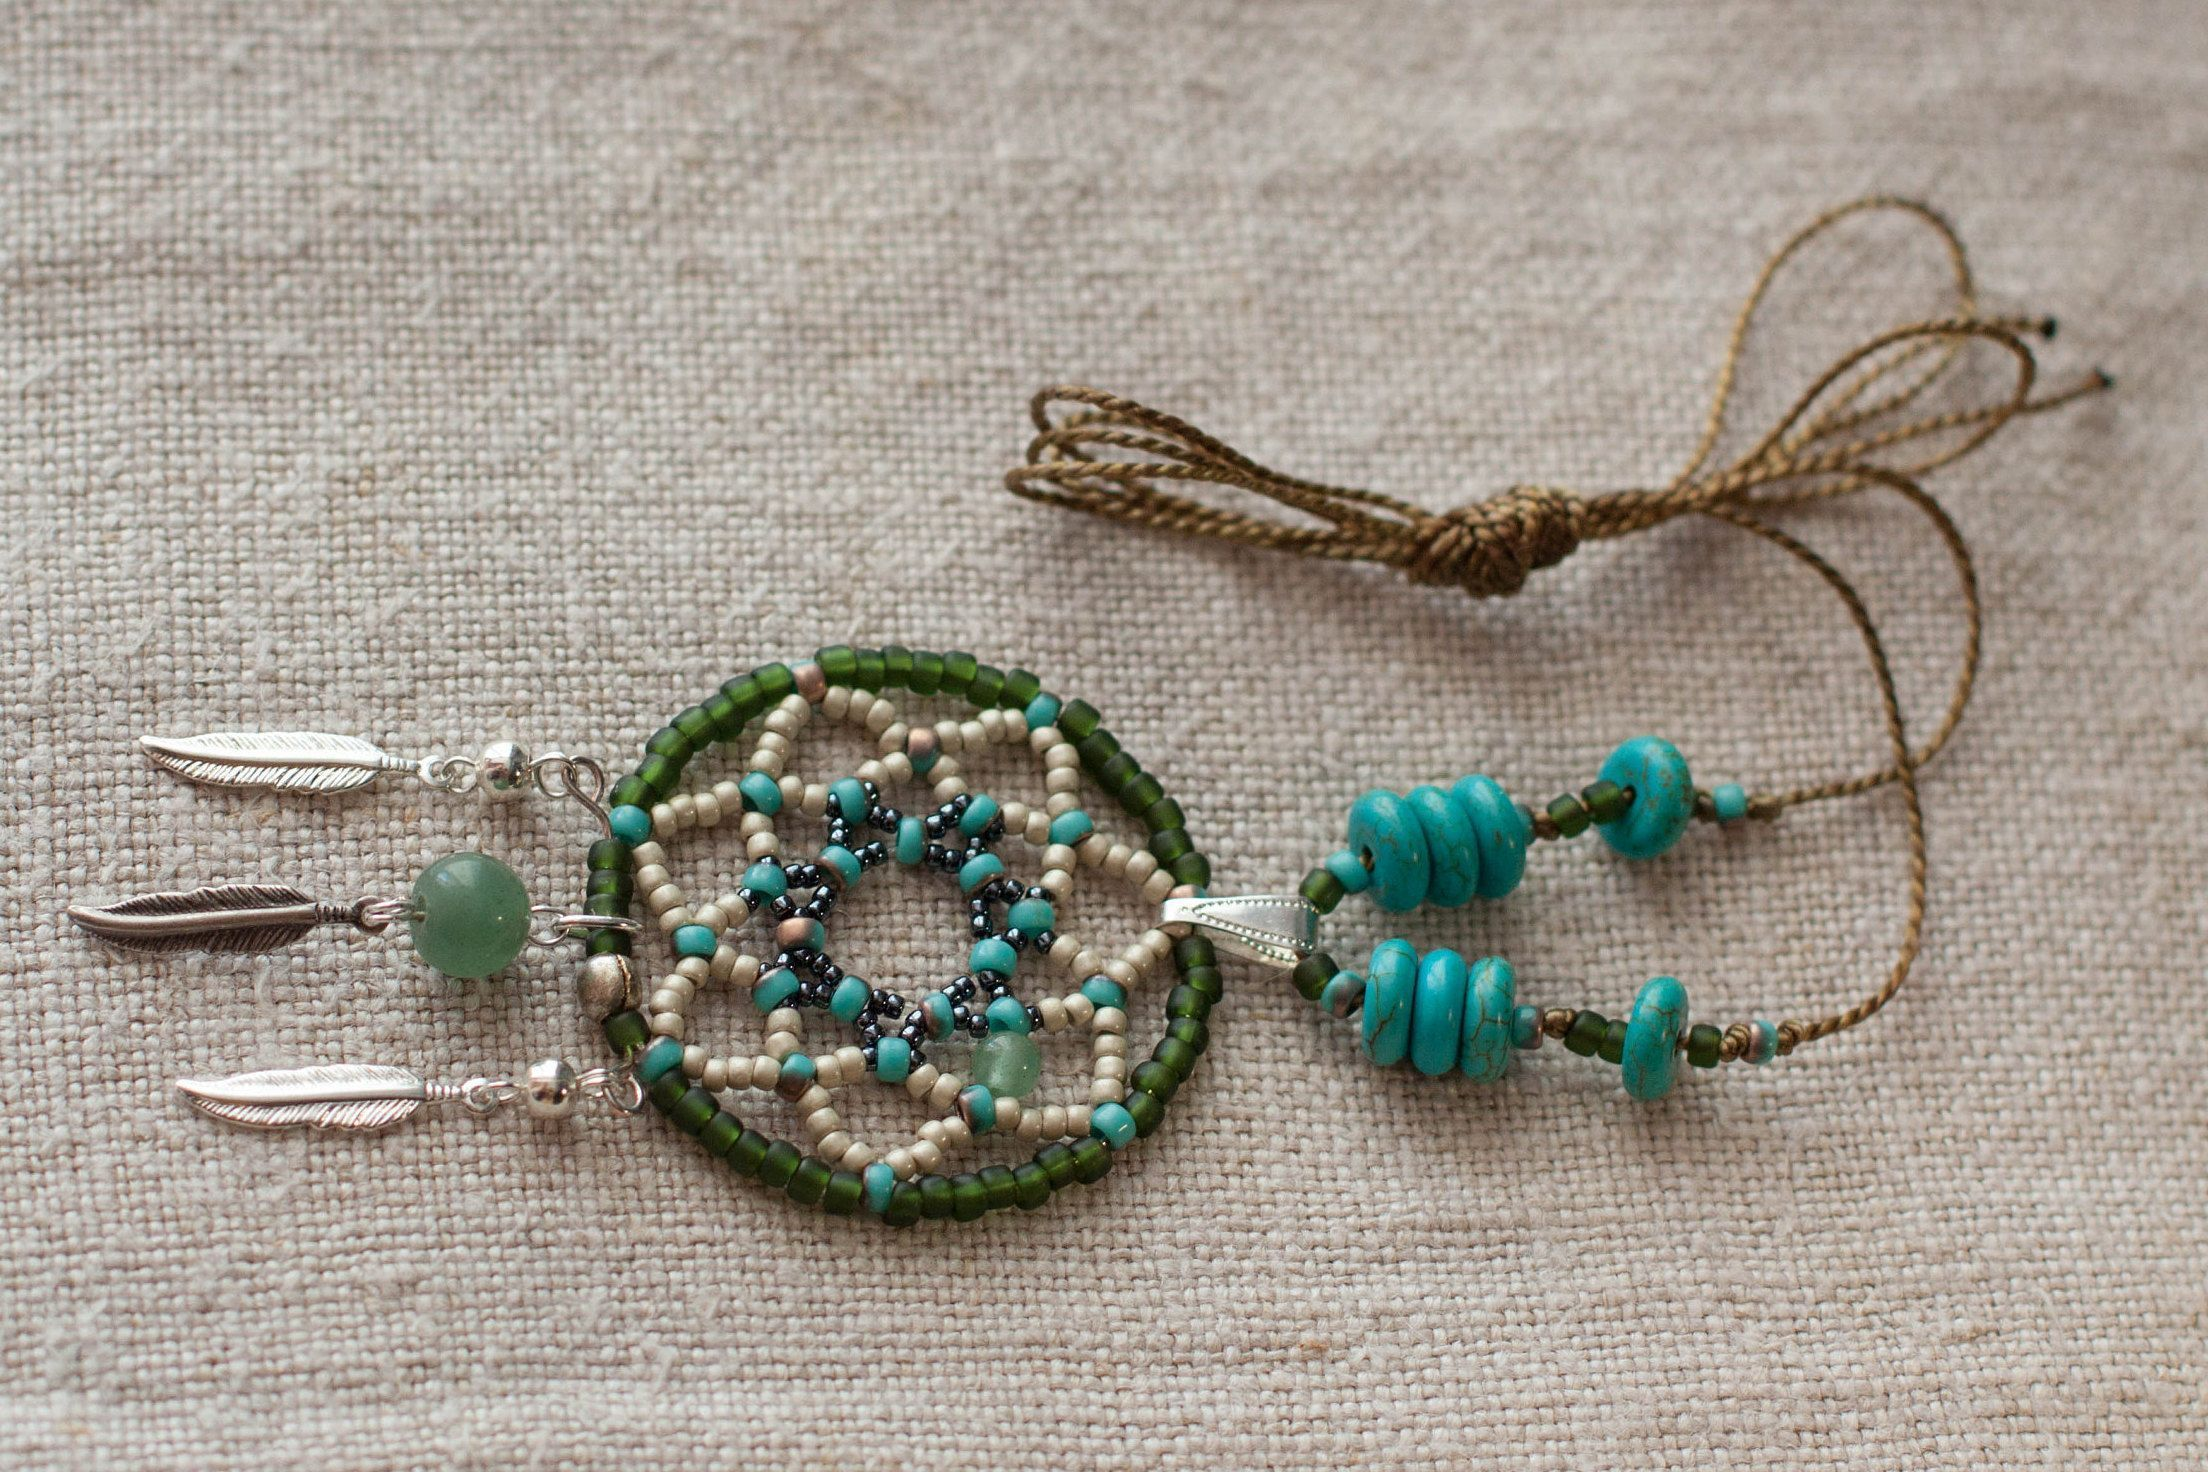 262e3df3920d5 Native american style #pendant, #Dreamcatcher beads jewelry, 2 ...